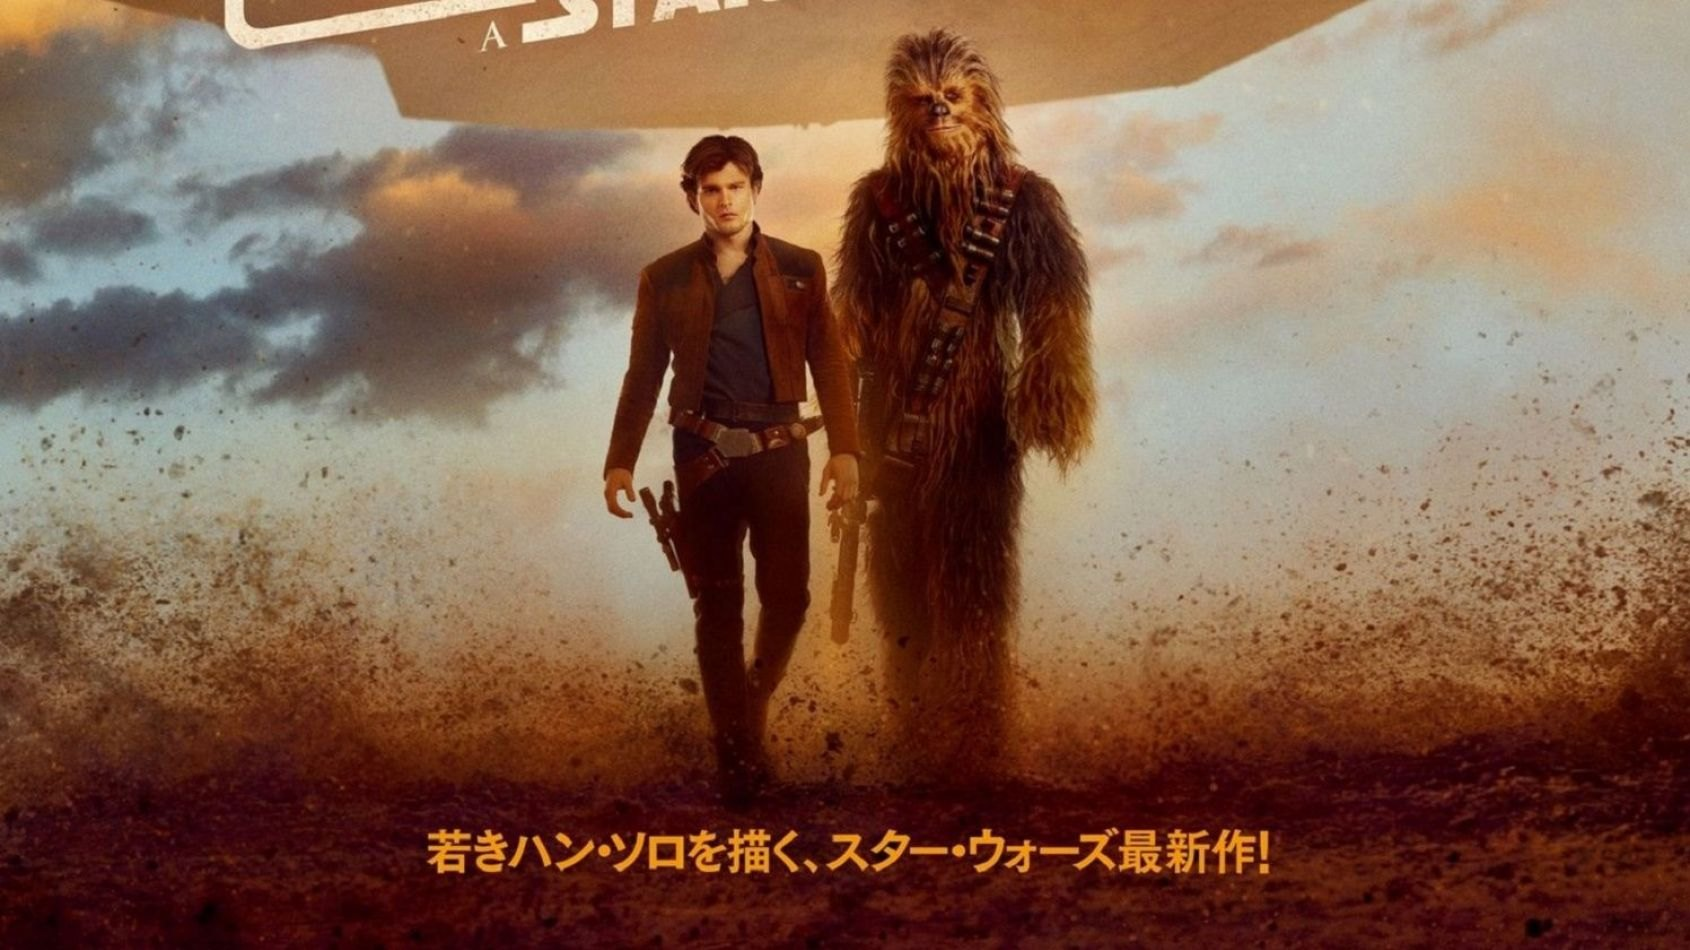 Rencontre star wars 2016